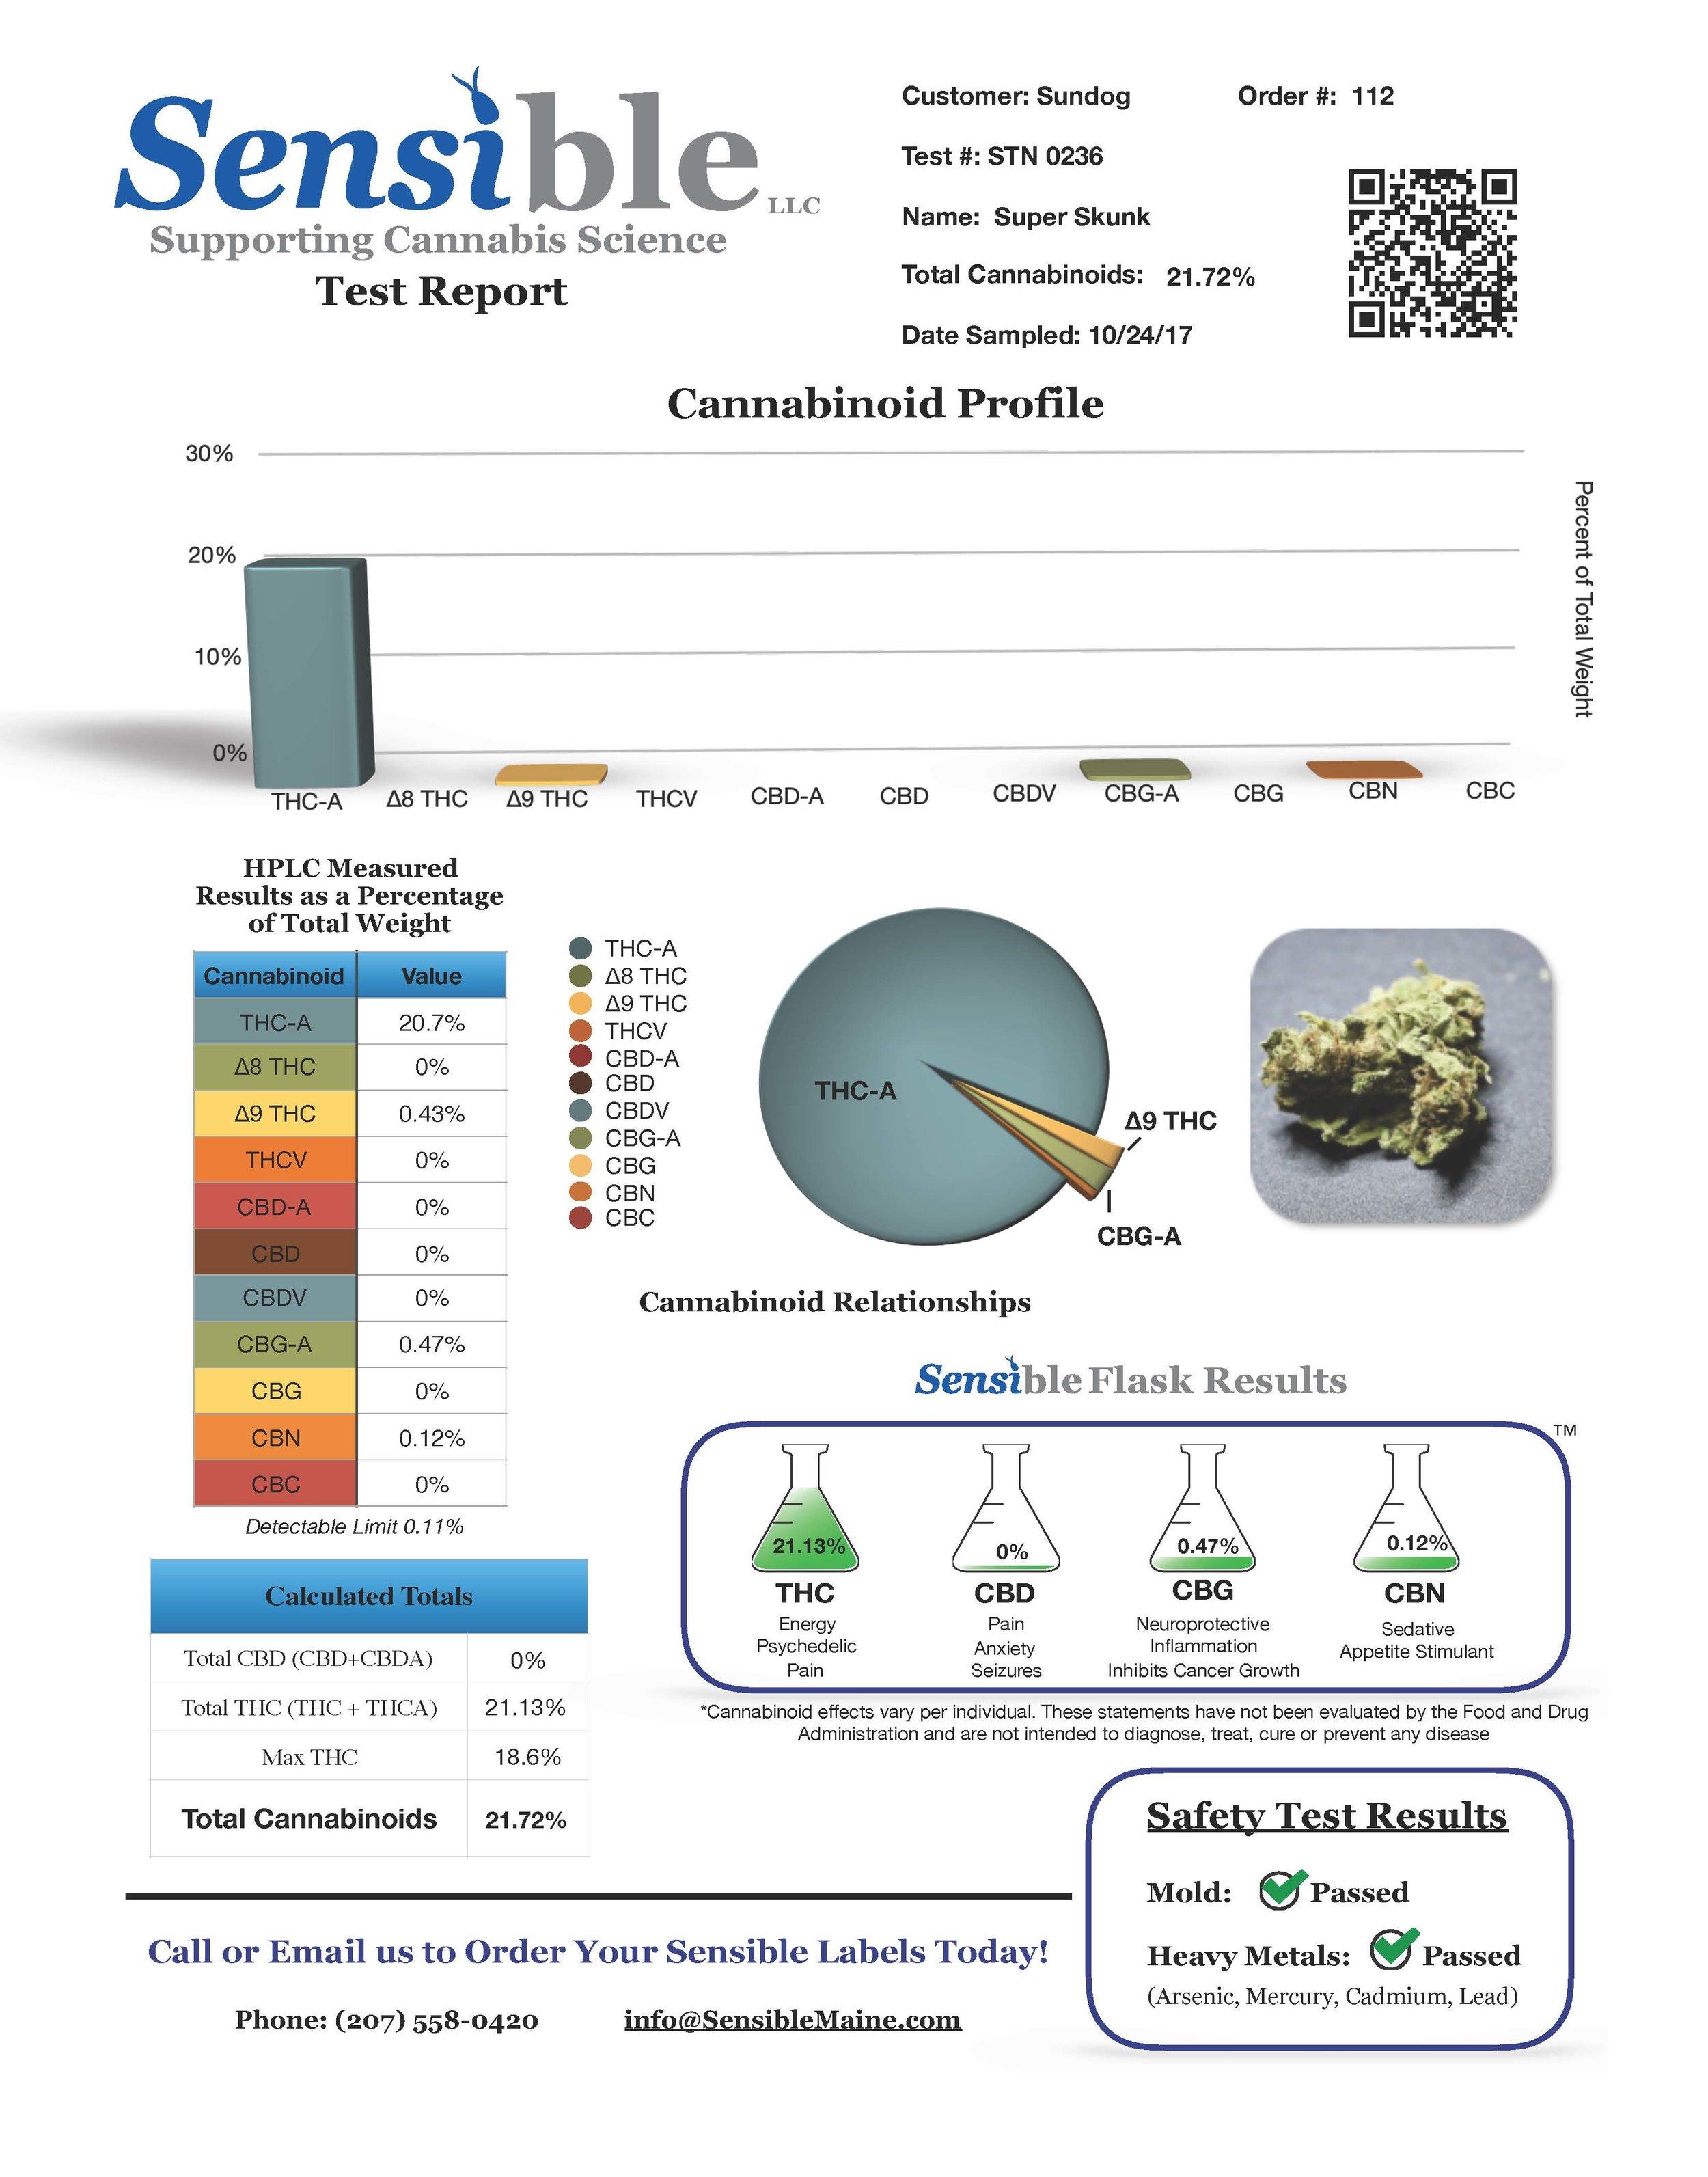 Test Report stn0236.jpg